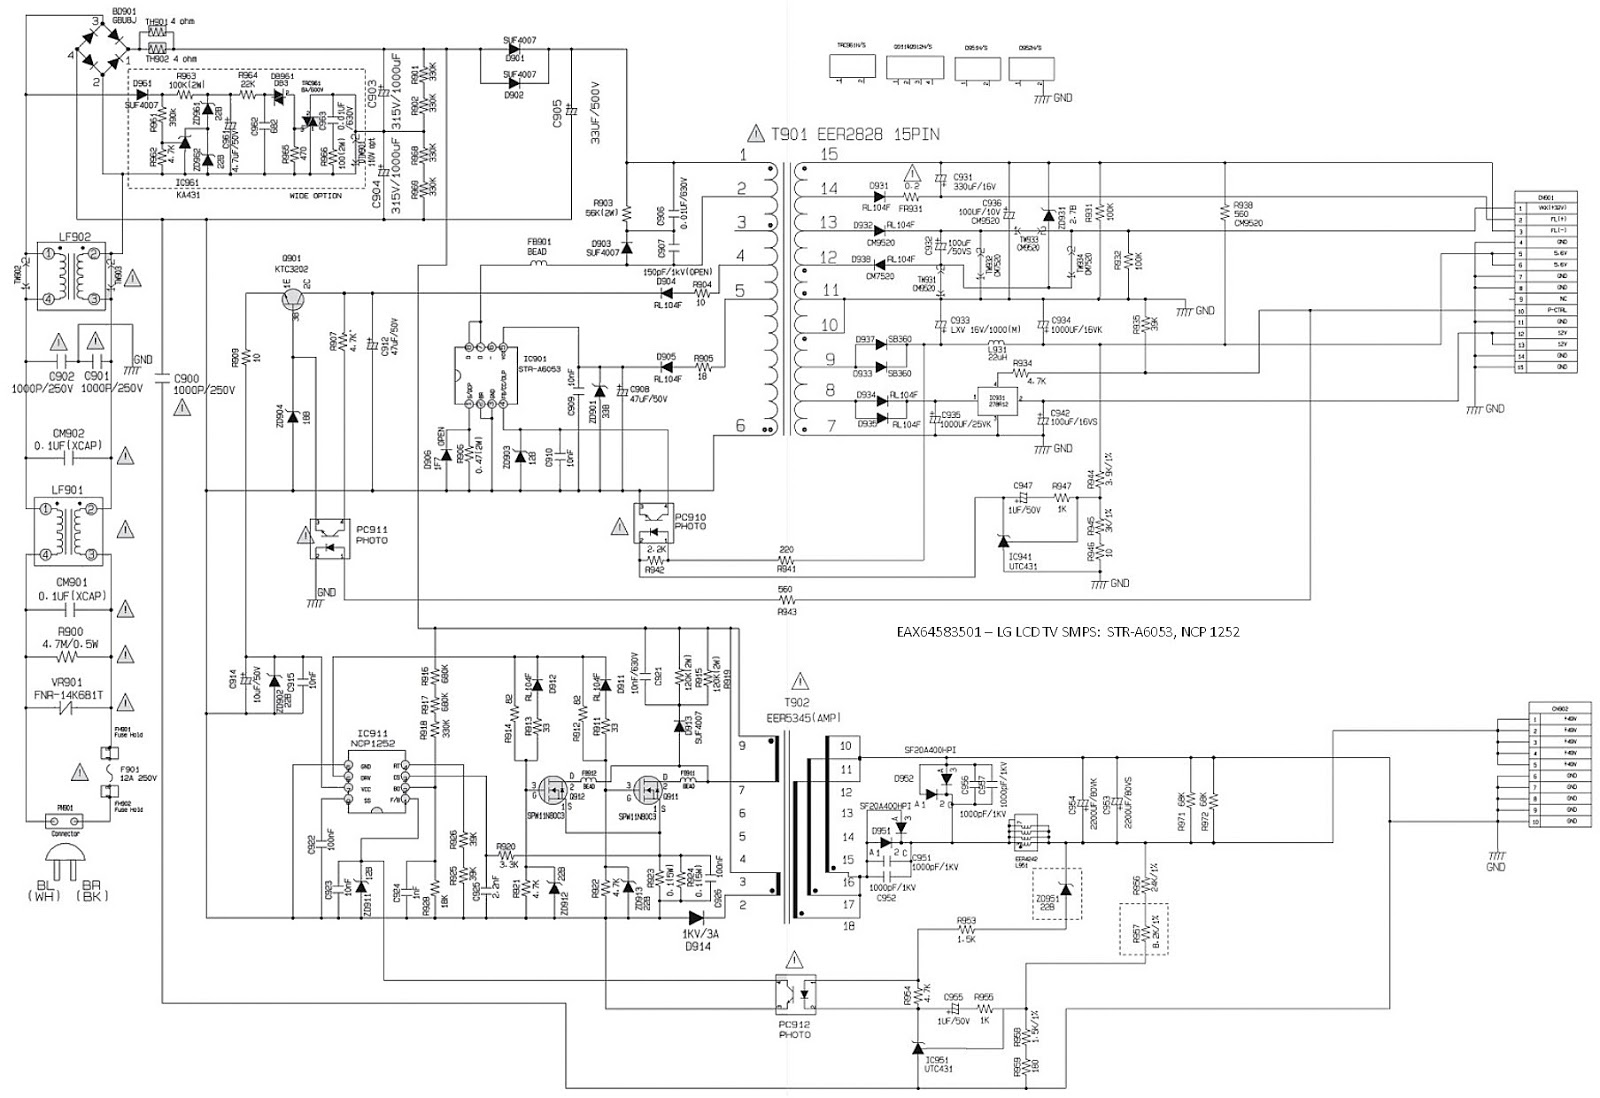 Schematic Diagrams: EAX64583501